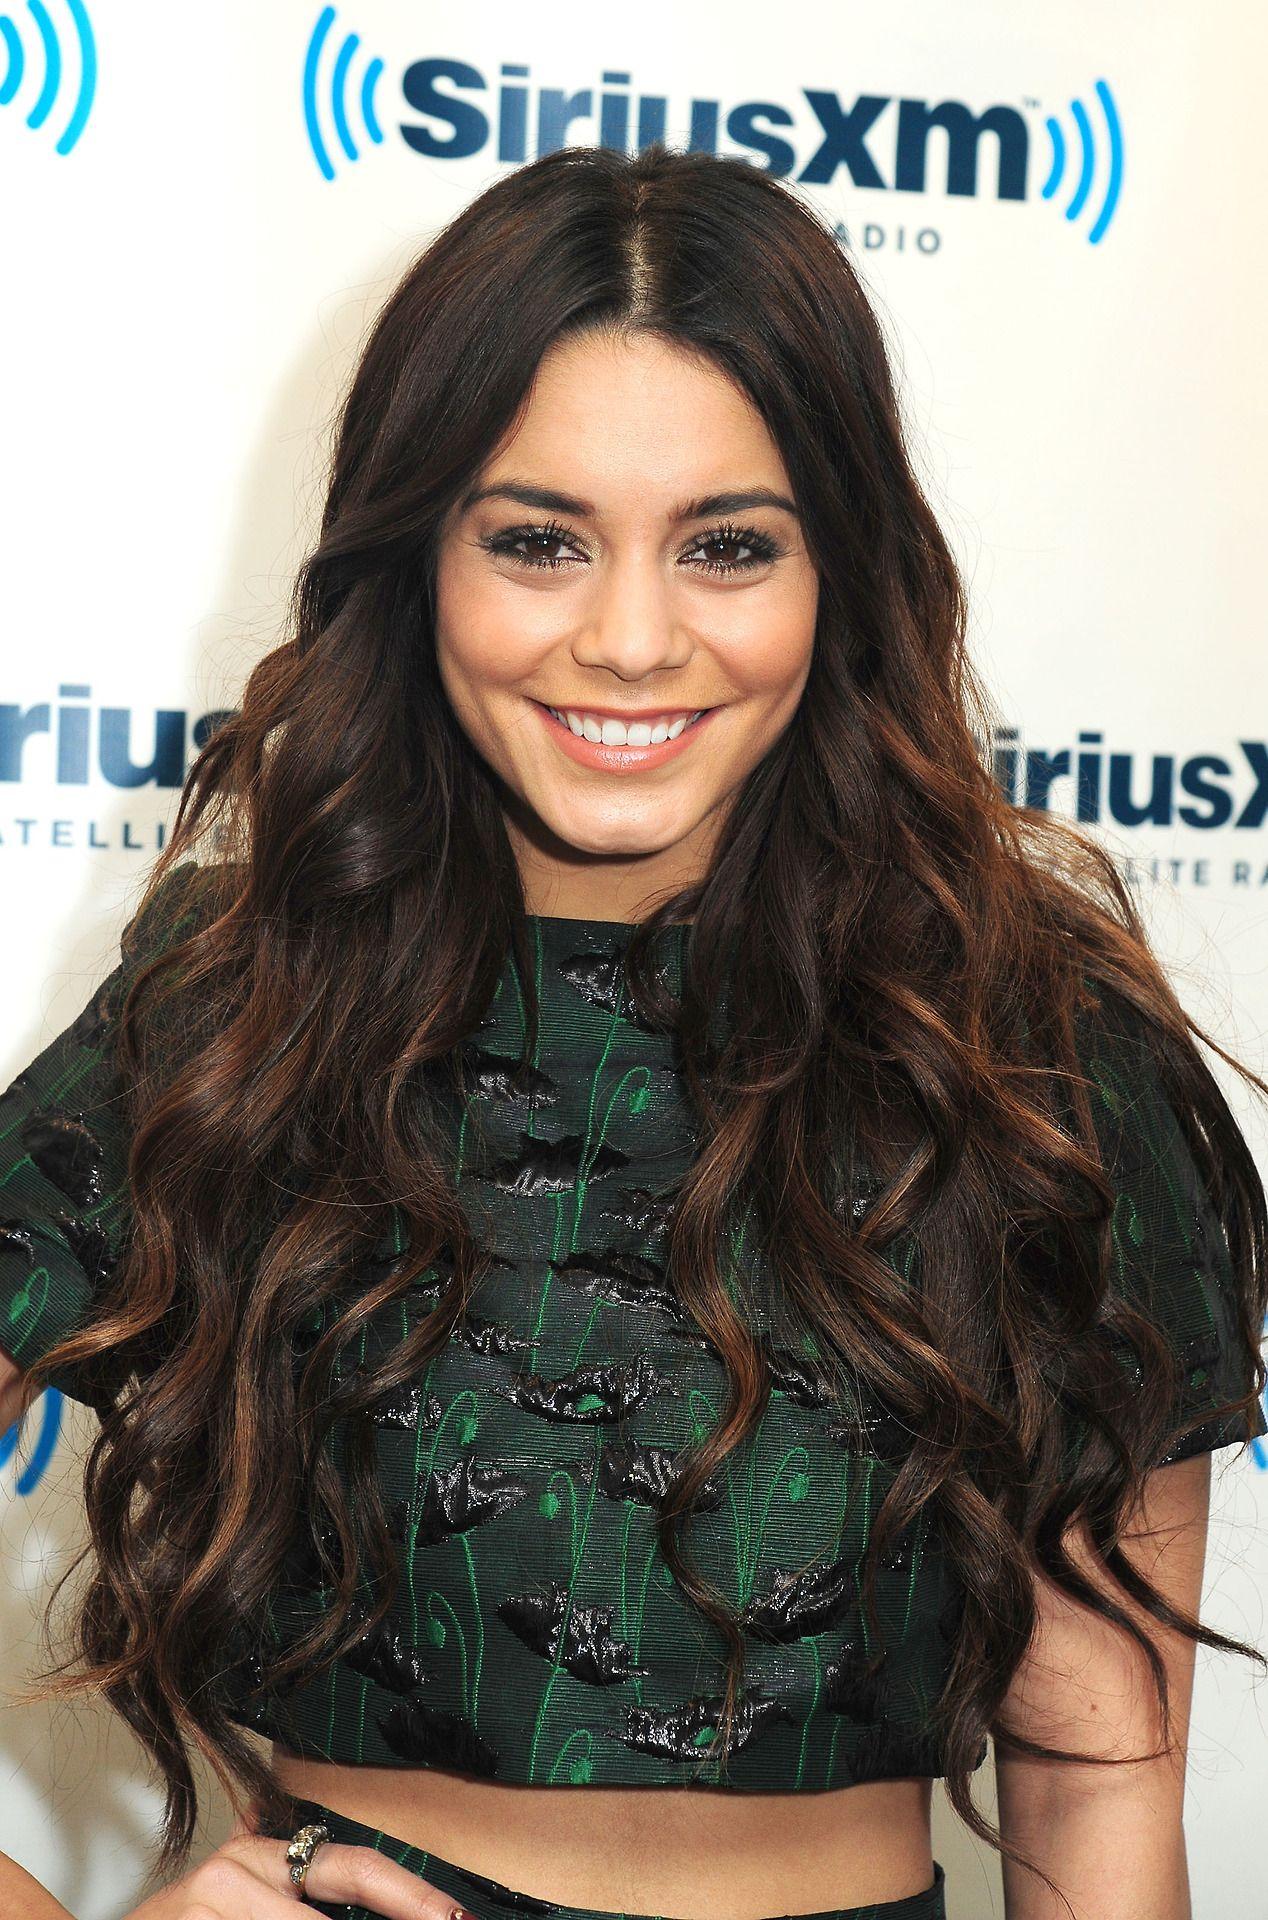 Vanessa Hudgens Like The Hair But Not The Shirt Csc Pinterest